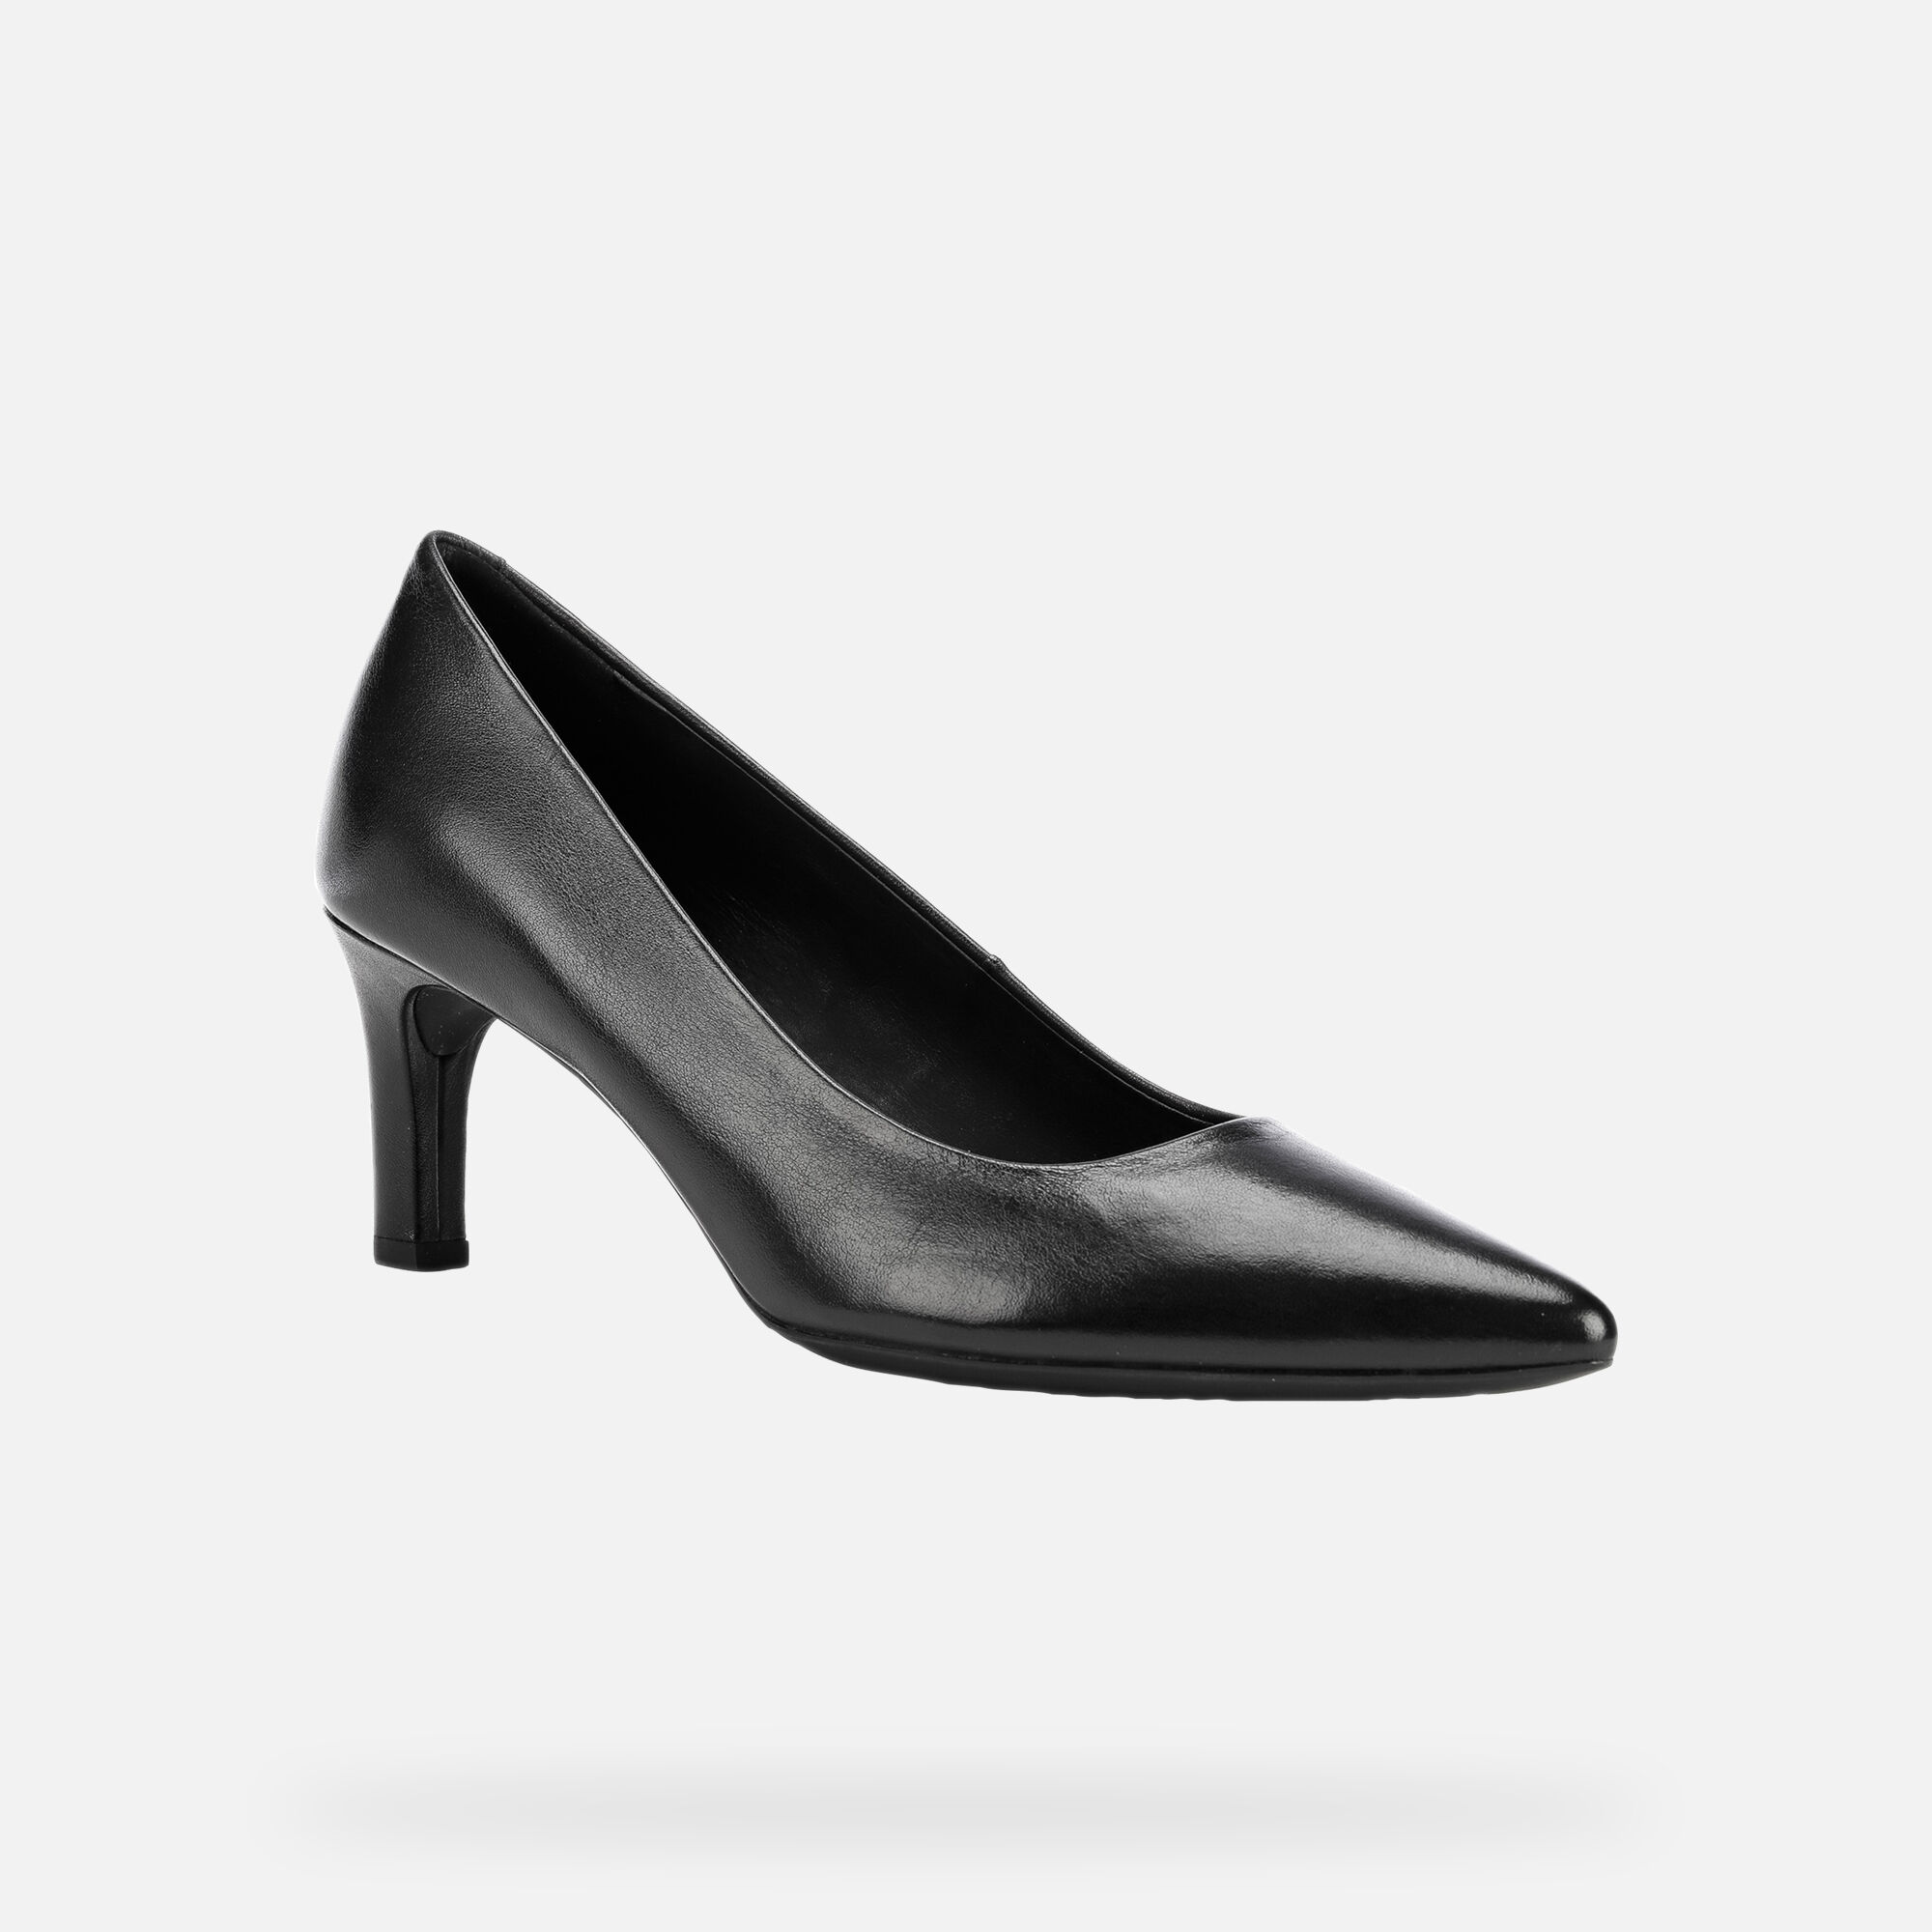 Geox BIBBIANA Woman: Black Shoes | Geox